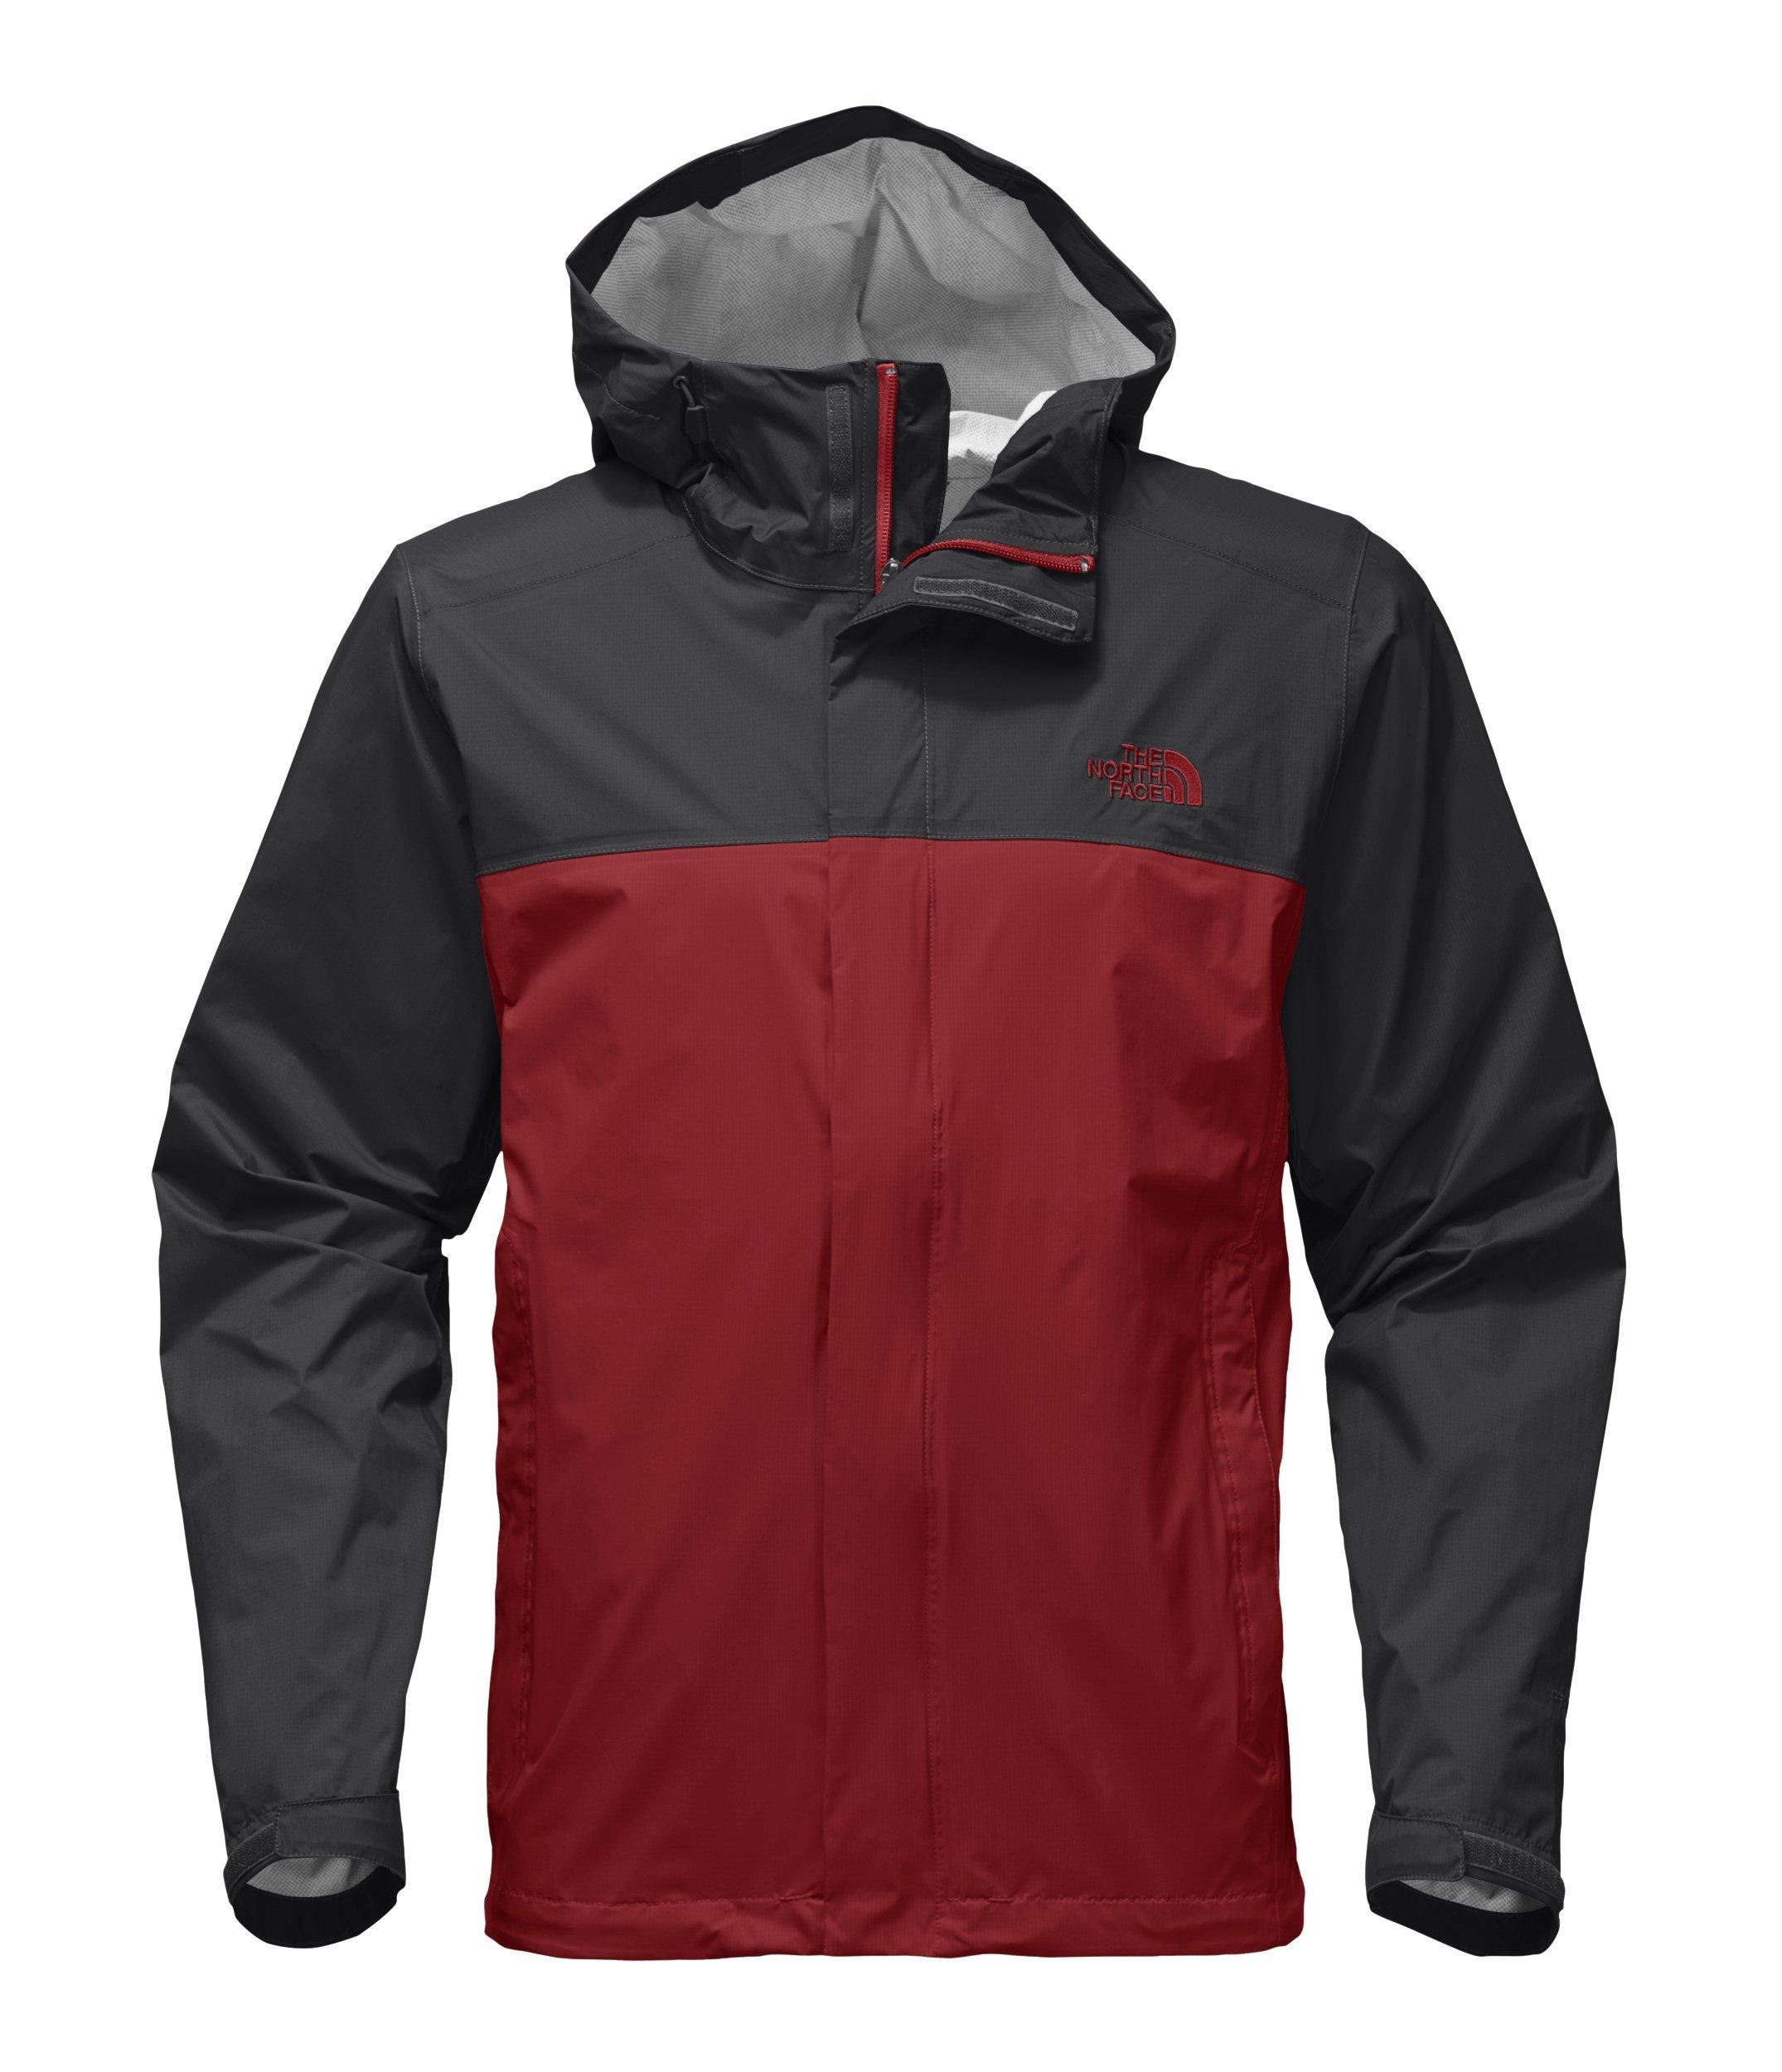 The North Face Men's Venture 2 Jacket - Cardinal Red and Asphalt Grey - XXL